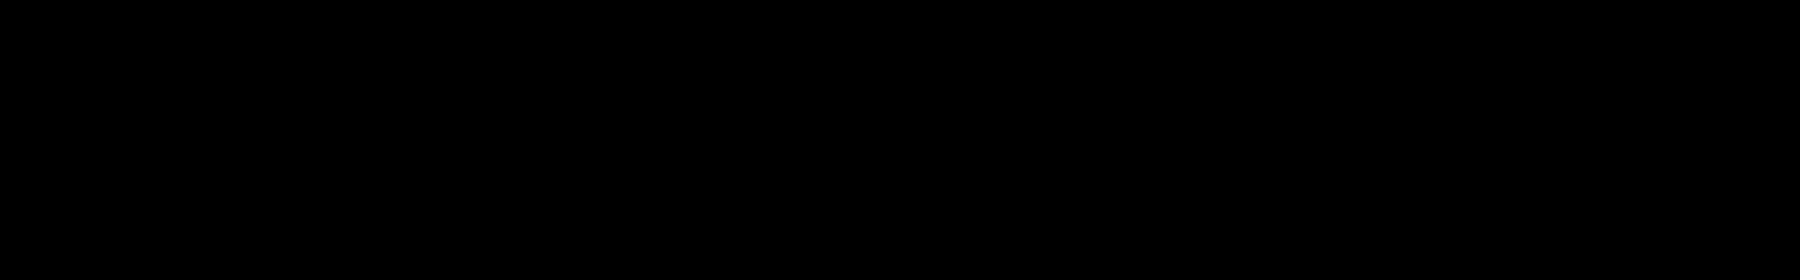 VIPER - Hybrid Violin Loops by Vitera audio waveform